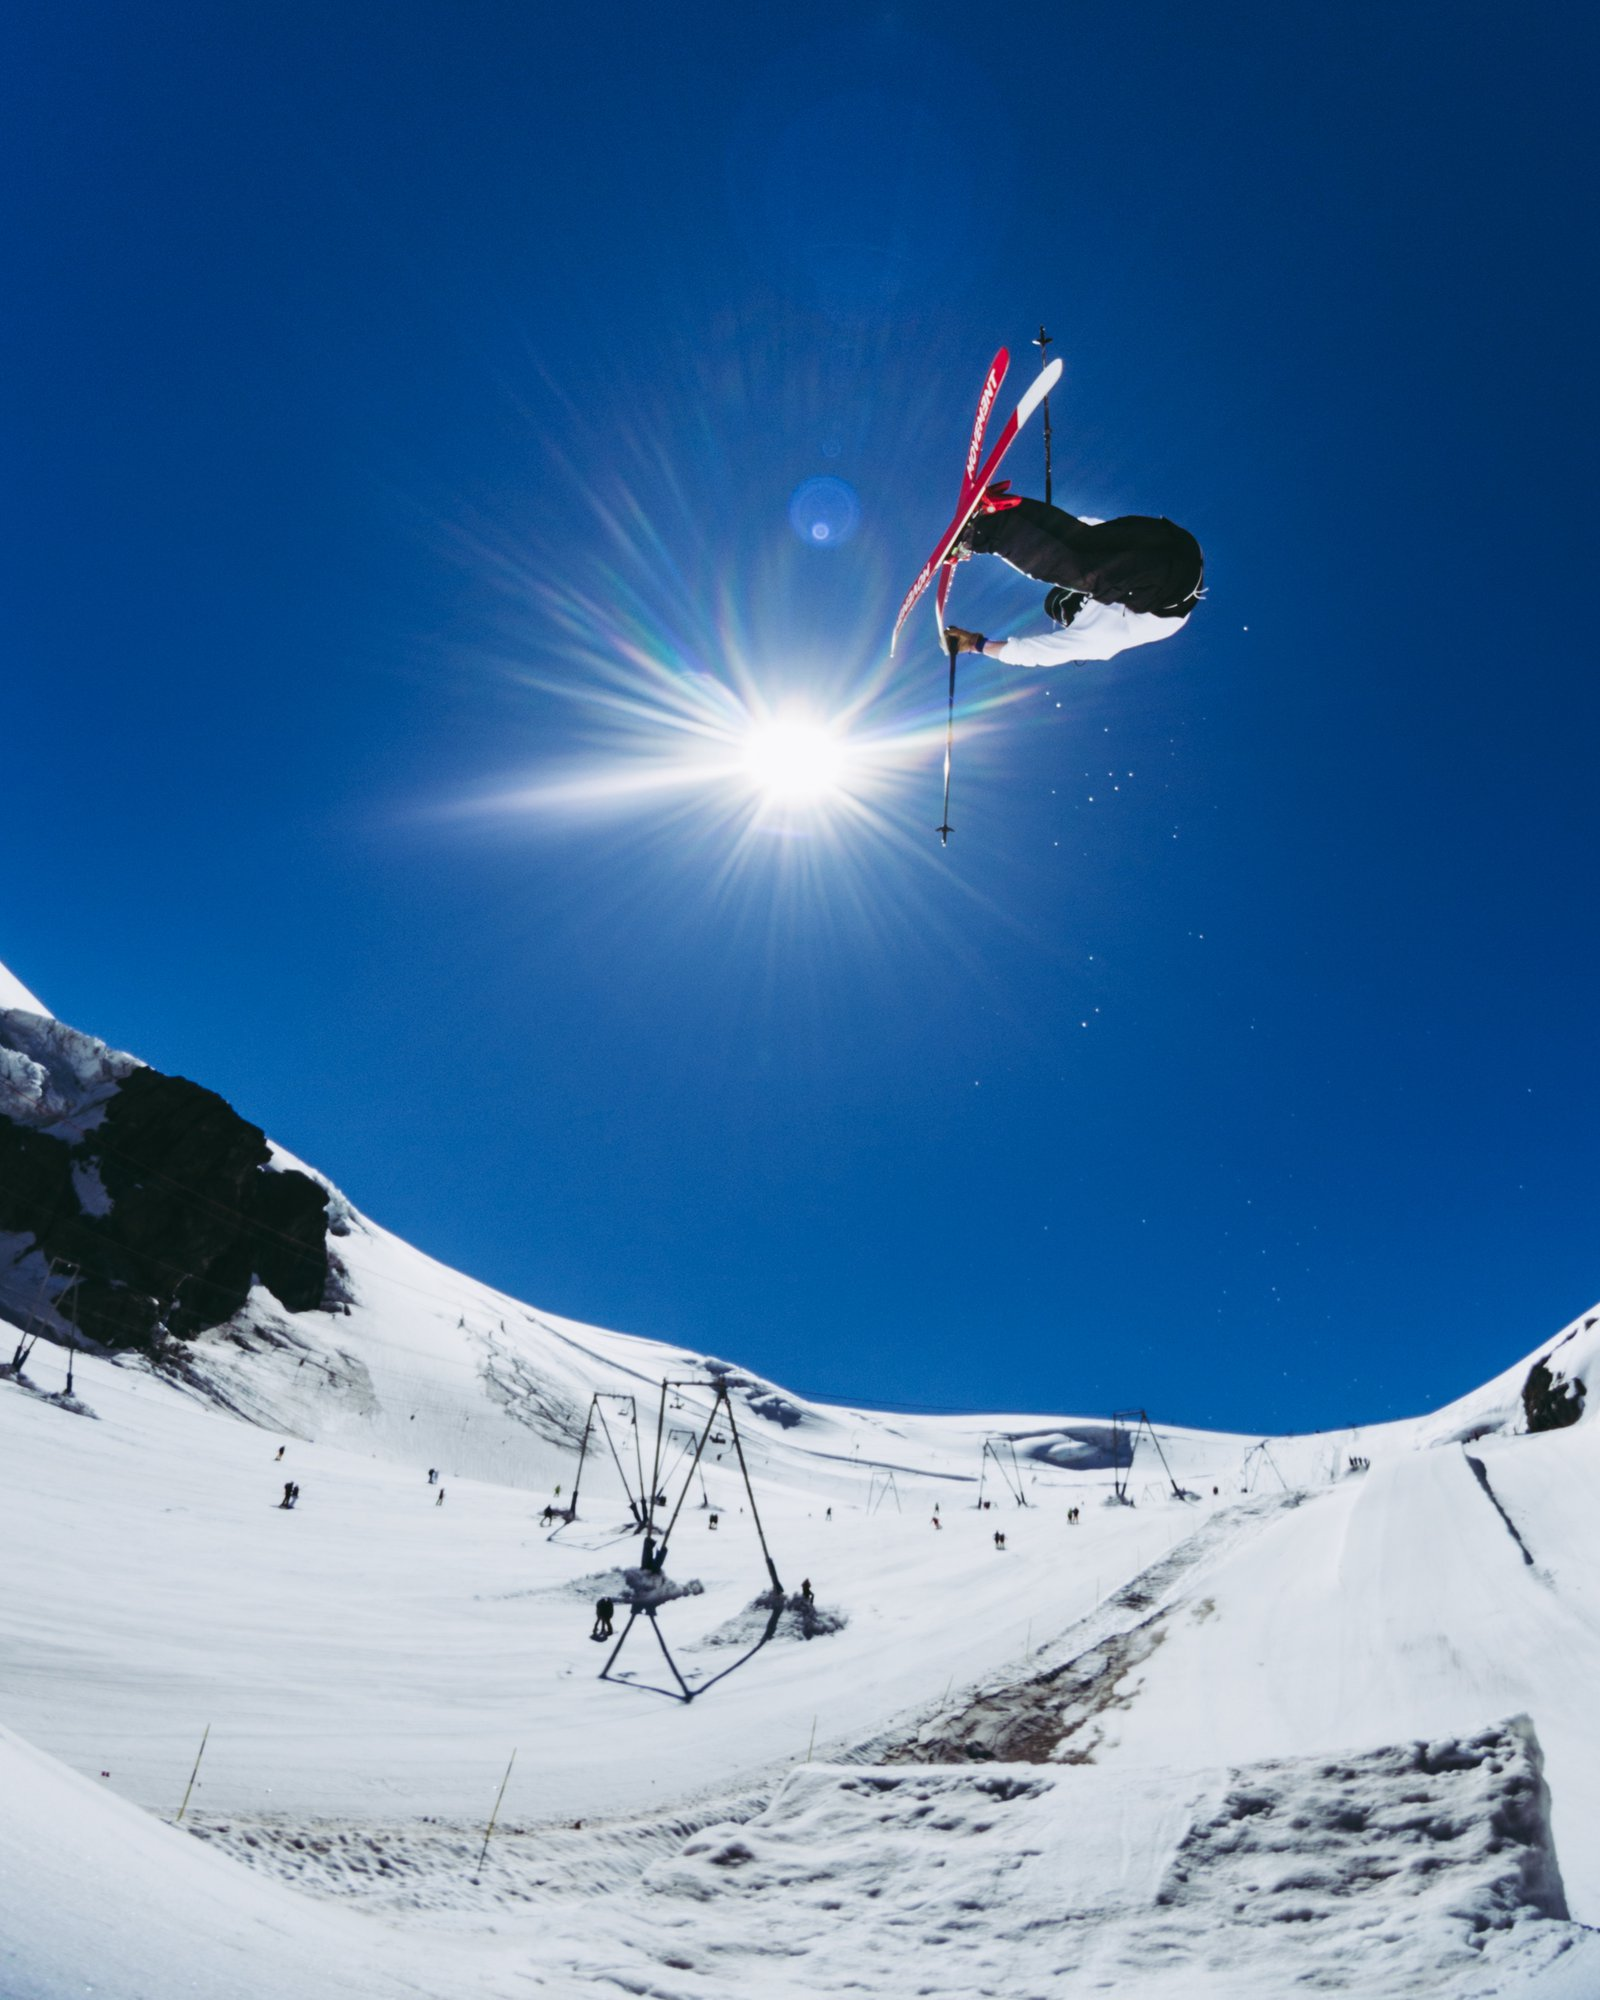 LDM // Summerpark Zermatt 2k18